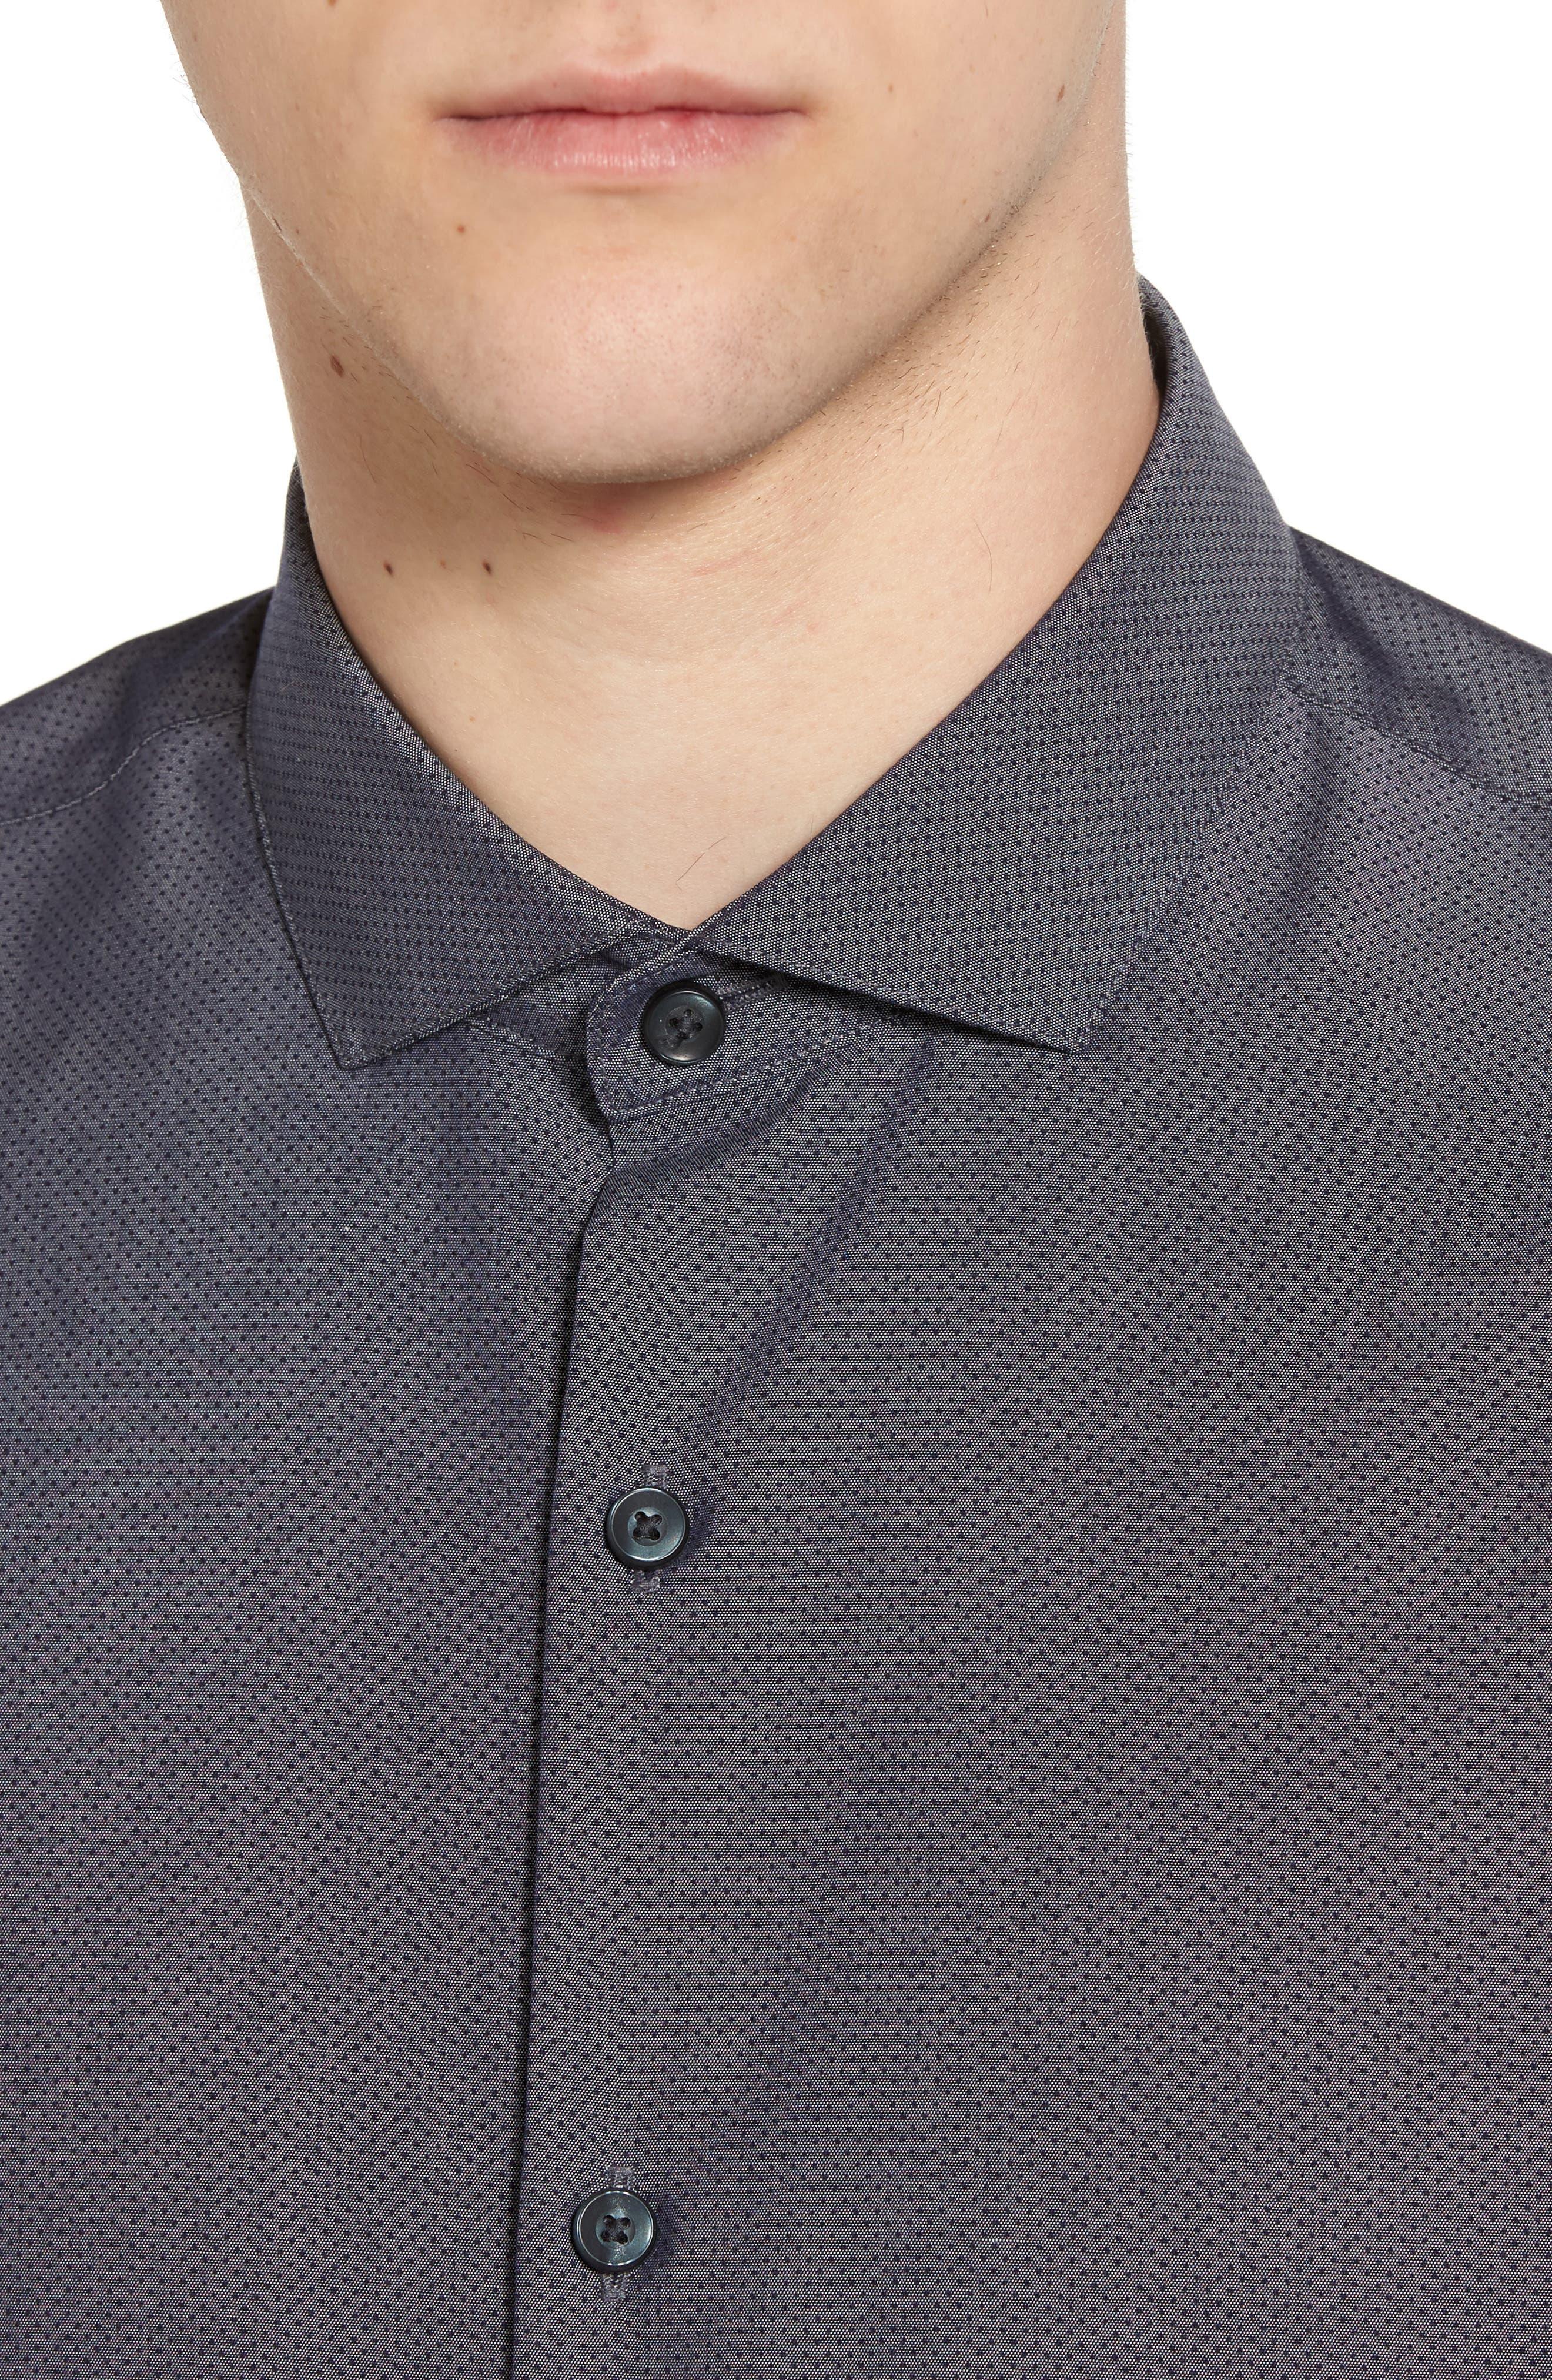 Alternate Image 2  - Calibrate Slim Fit Solid Sport Shirt